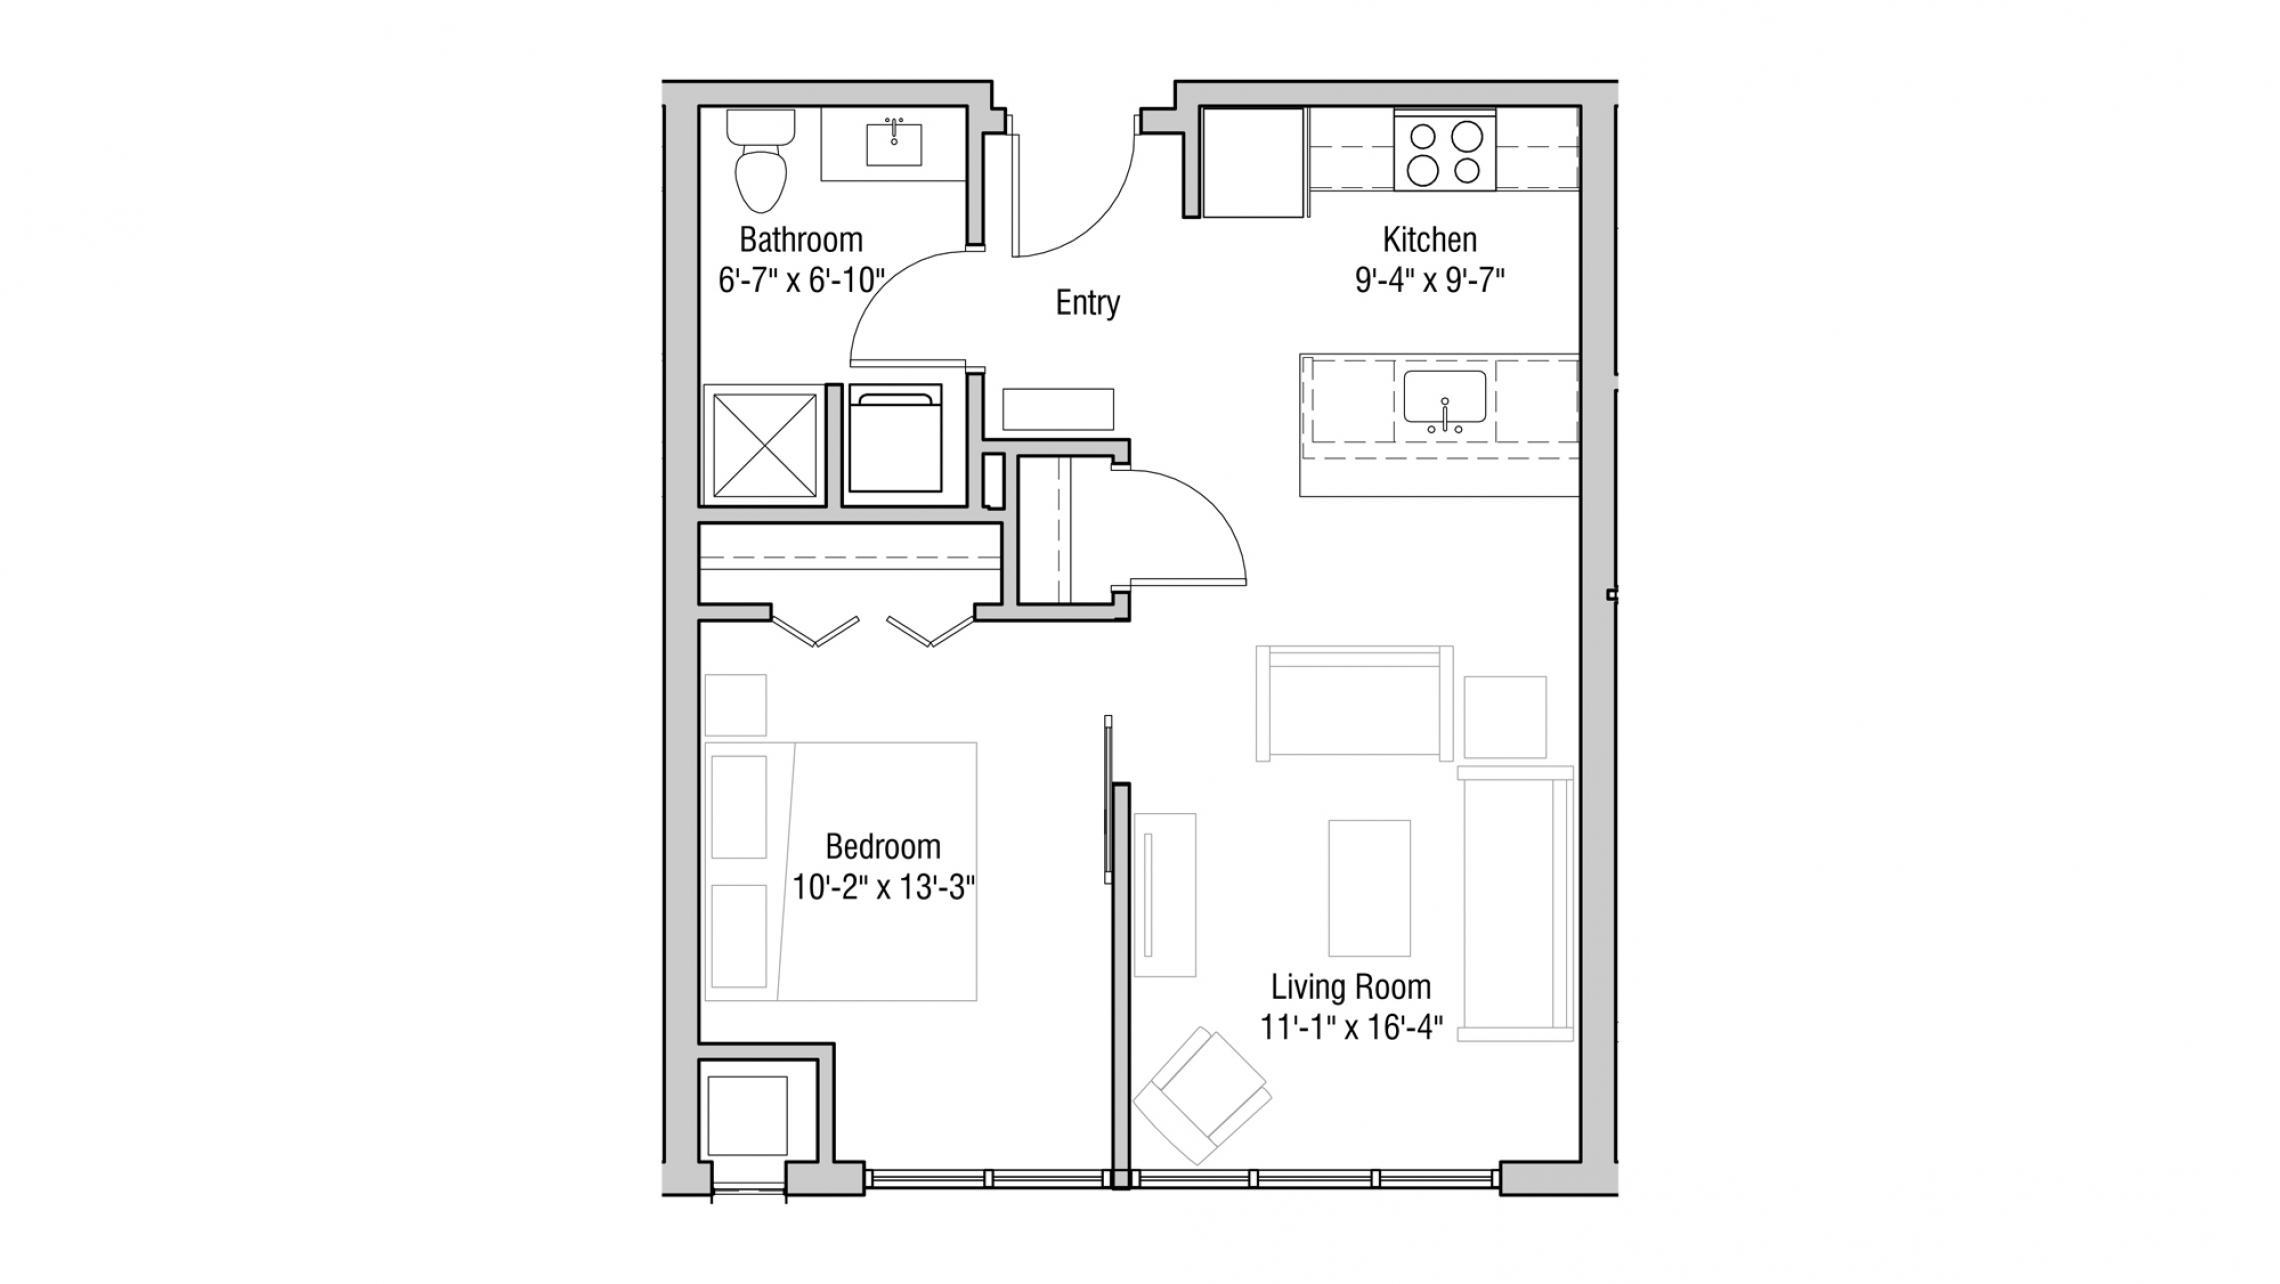 ULI Quarter Row 322 - One Bedroom, One Bathroom